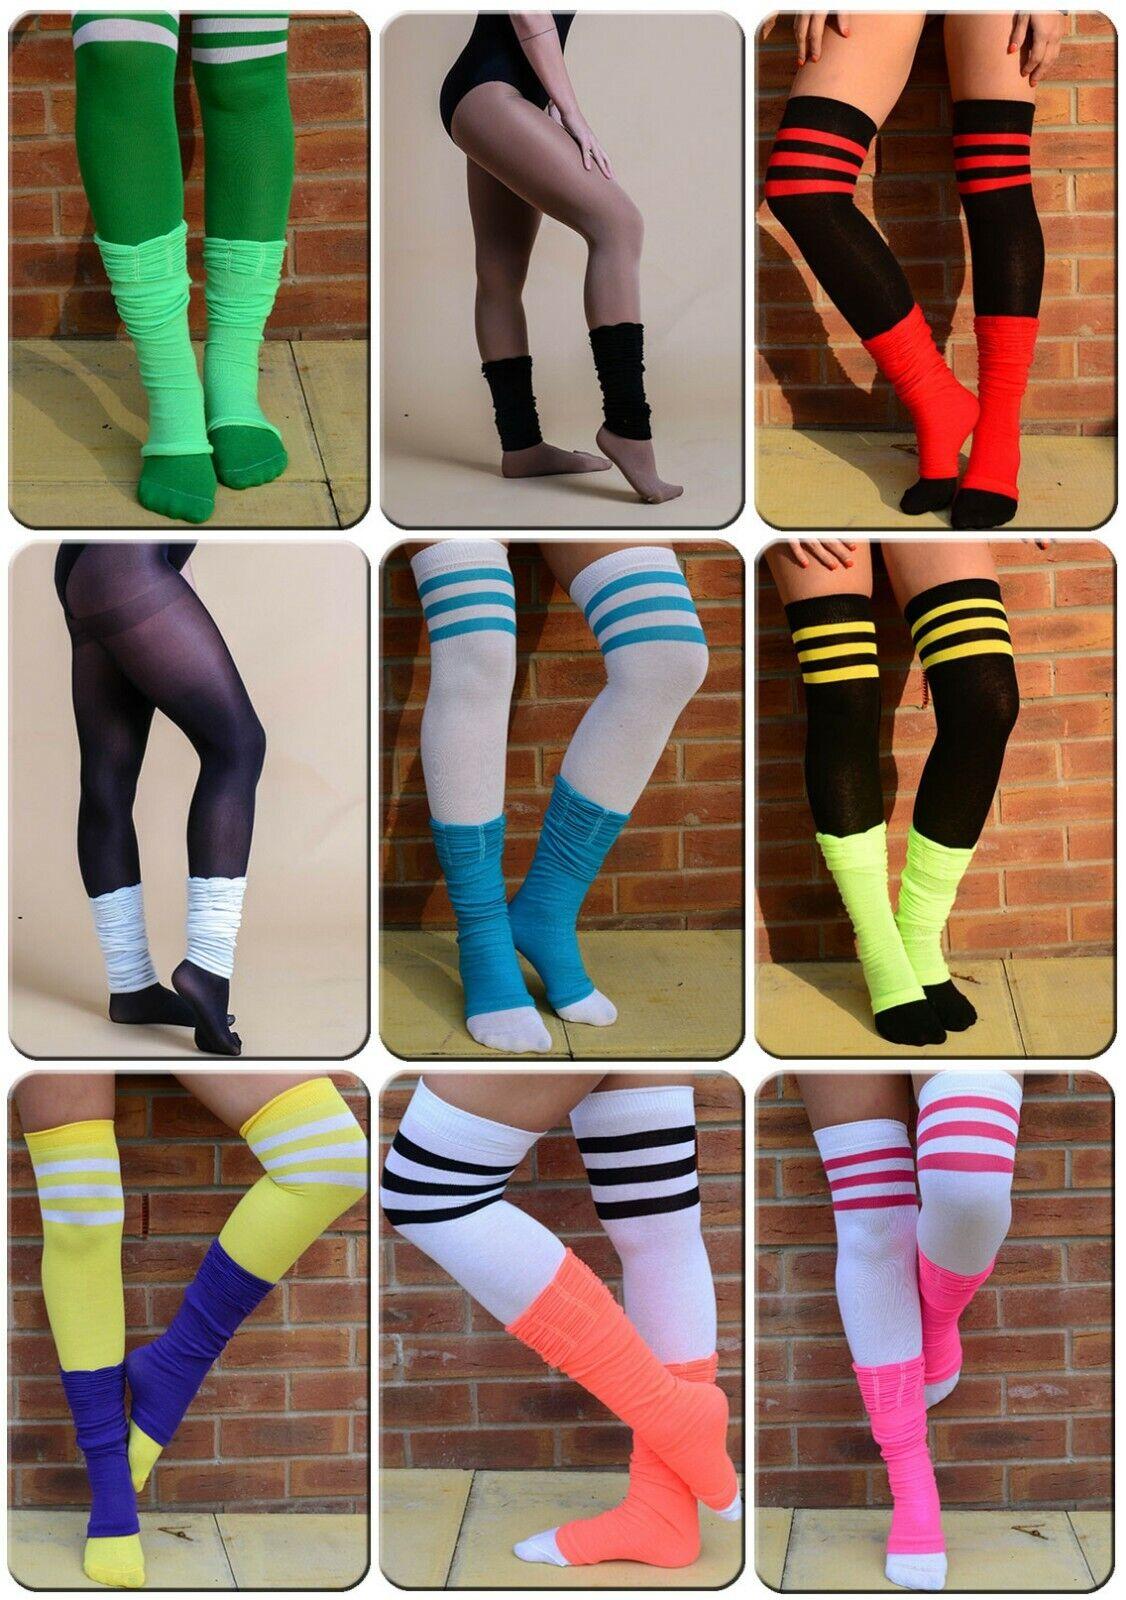 Girls Womens Plain Grey Legwarmers 80s Fancy Party Dance Rave Ballet Leg Warmer